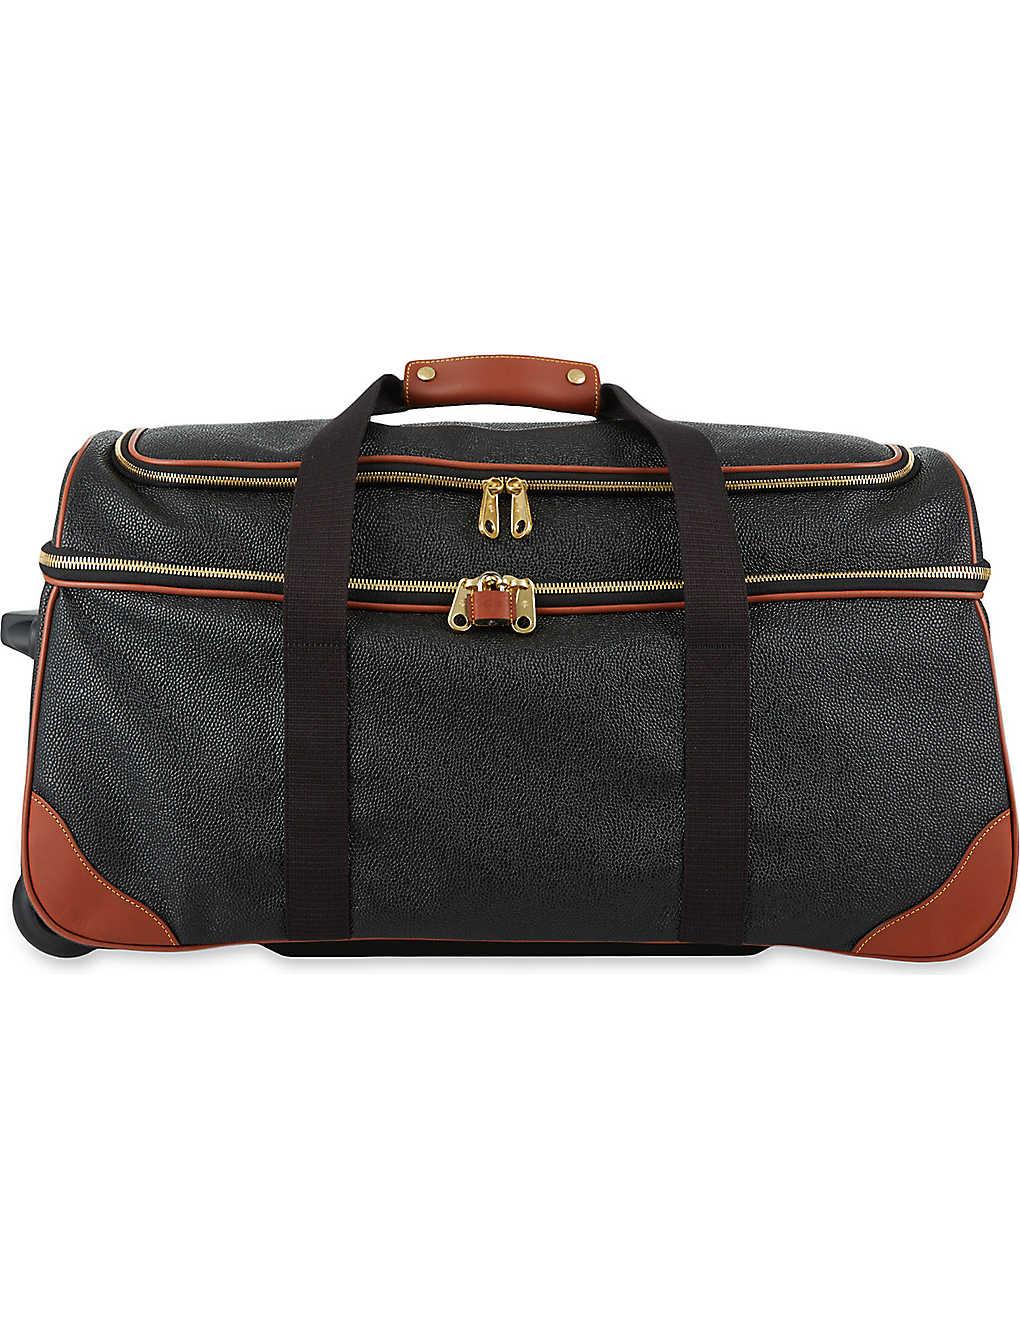 4ce76aa1034 MULBERRY - Albany Scotchgrain two-wheel duffle bag | Selfridges.com